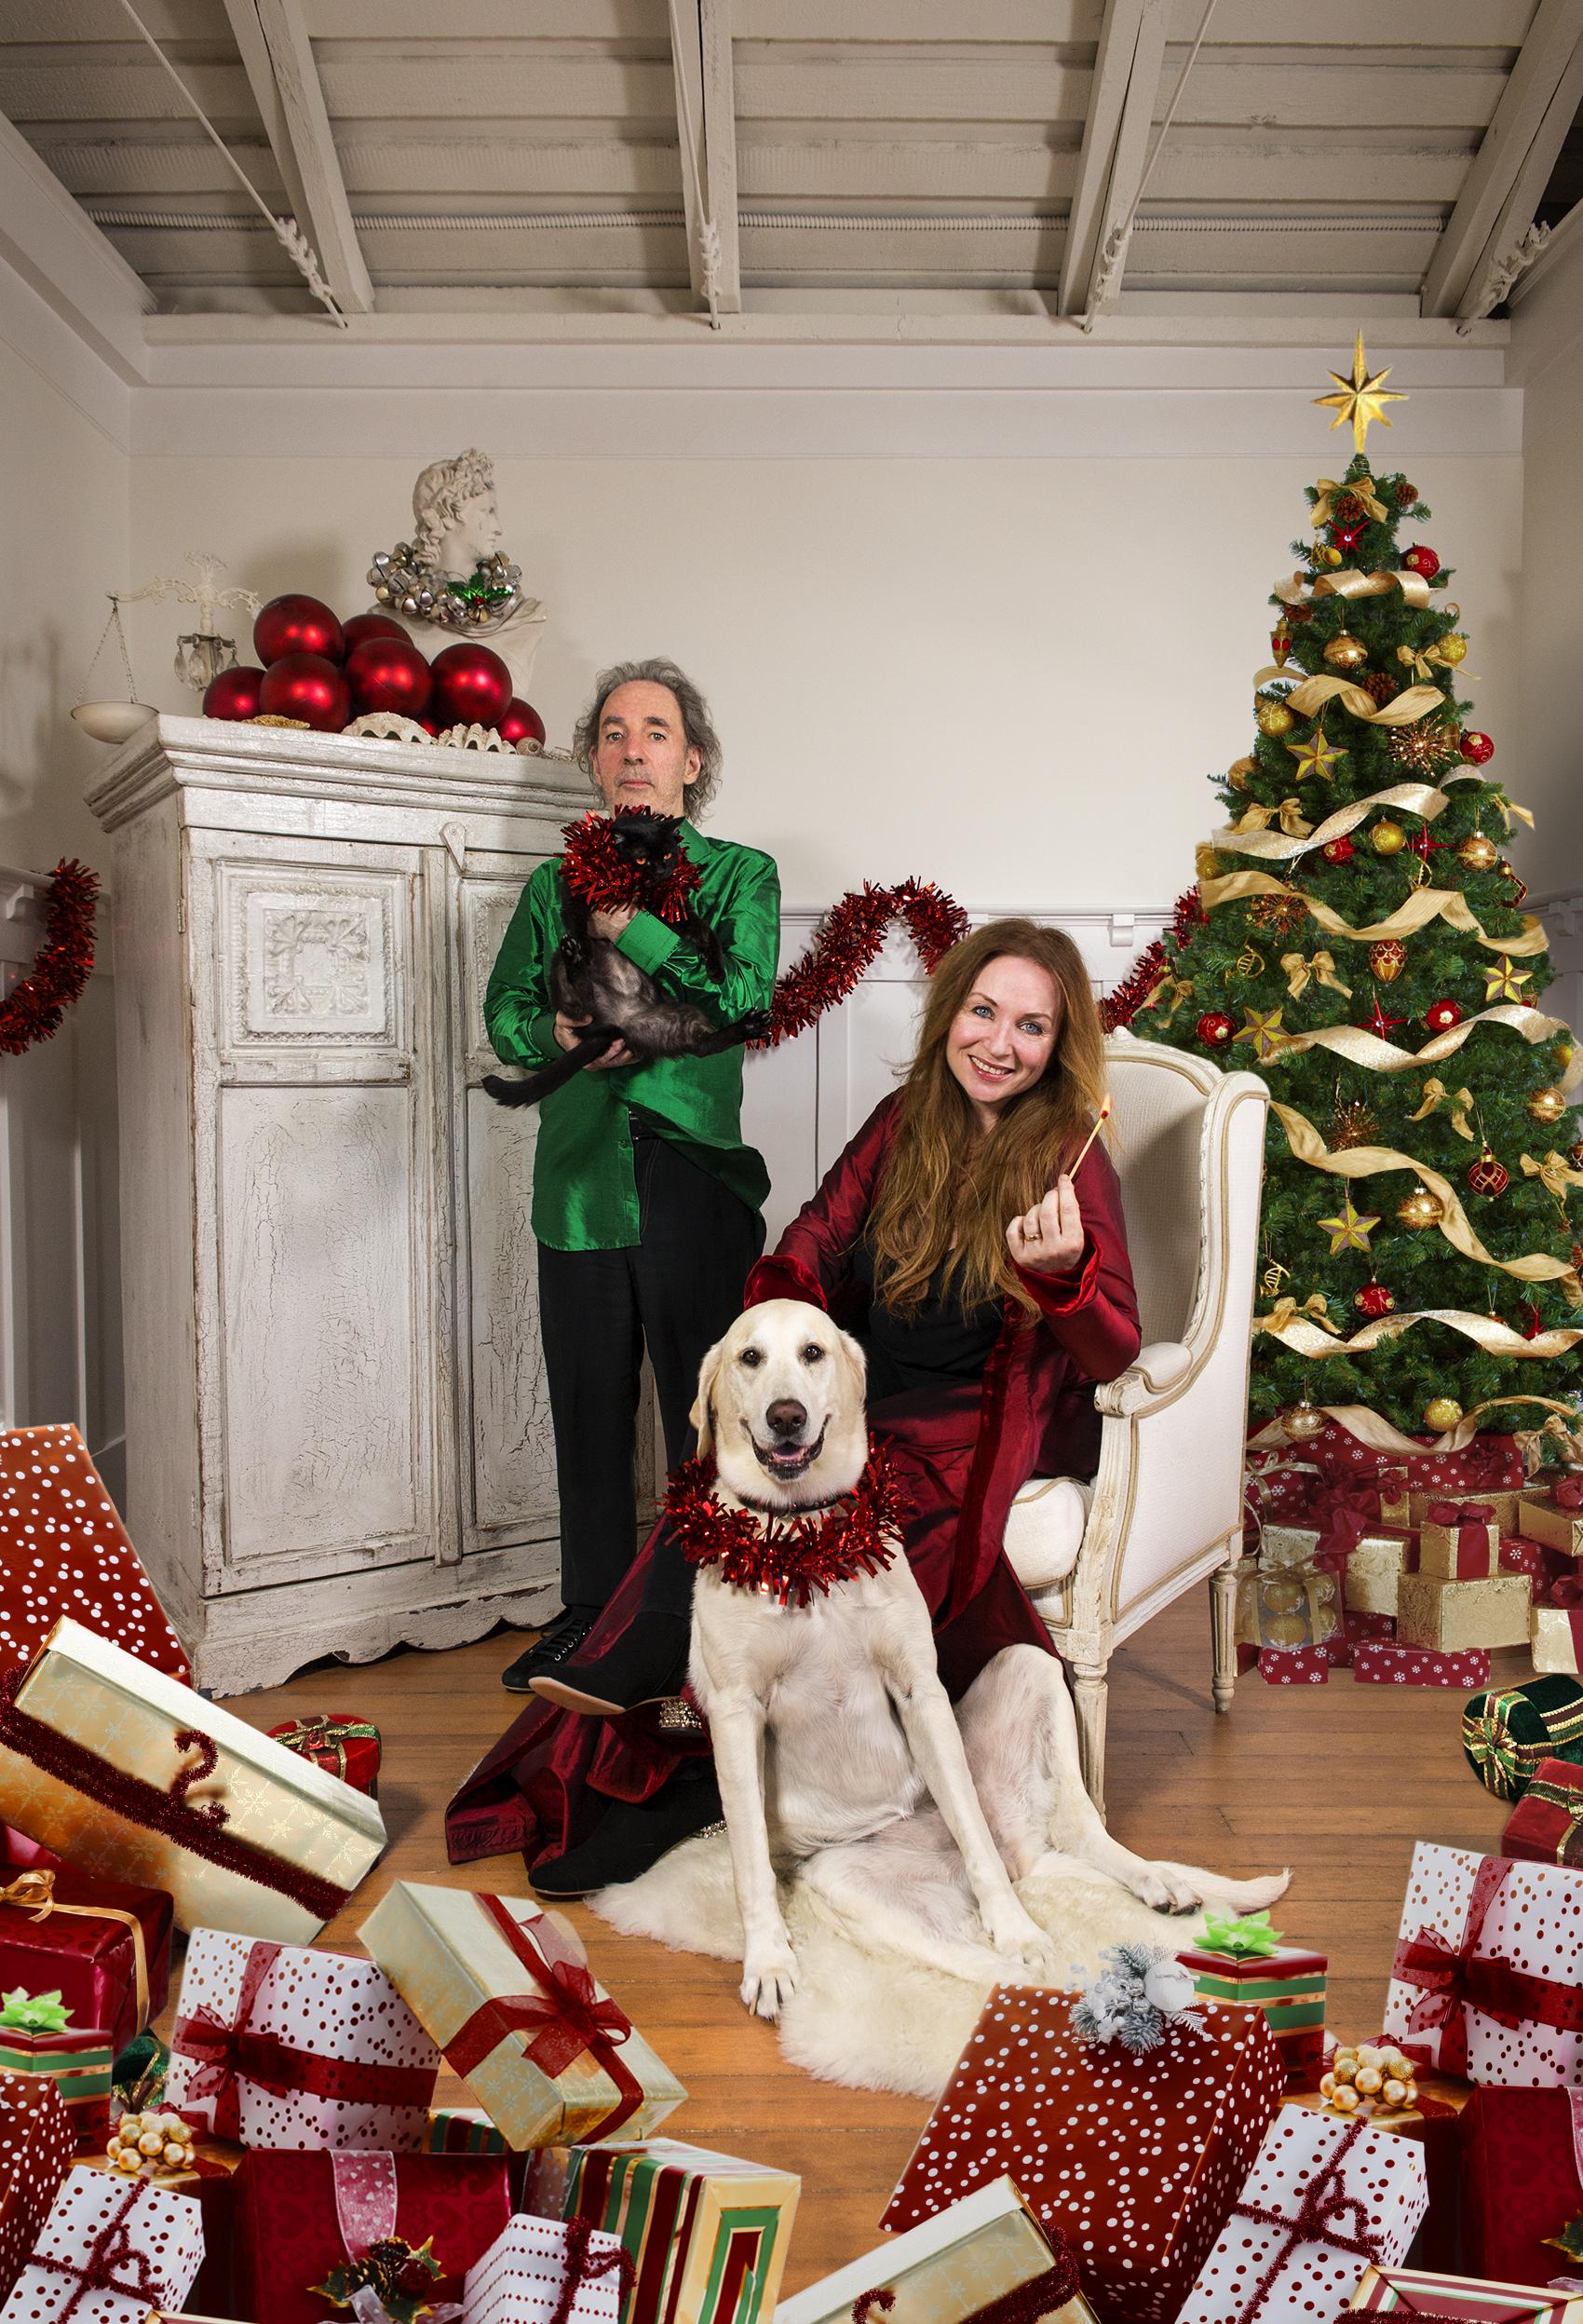 Hear Harry Shearer, Jane Lynch Parody Over-the-Top Christmas Songs ...